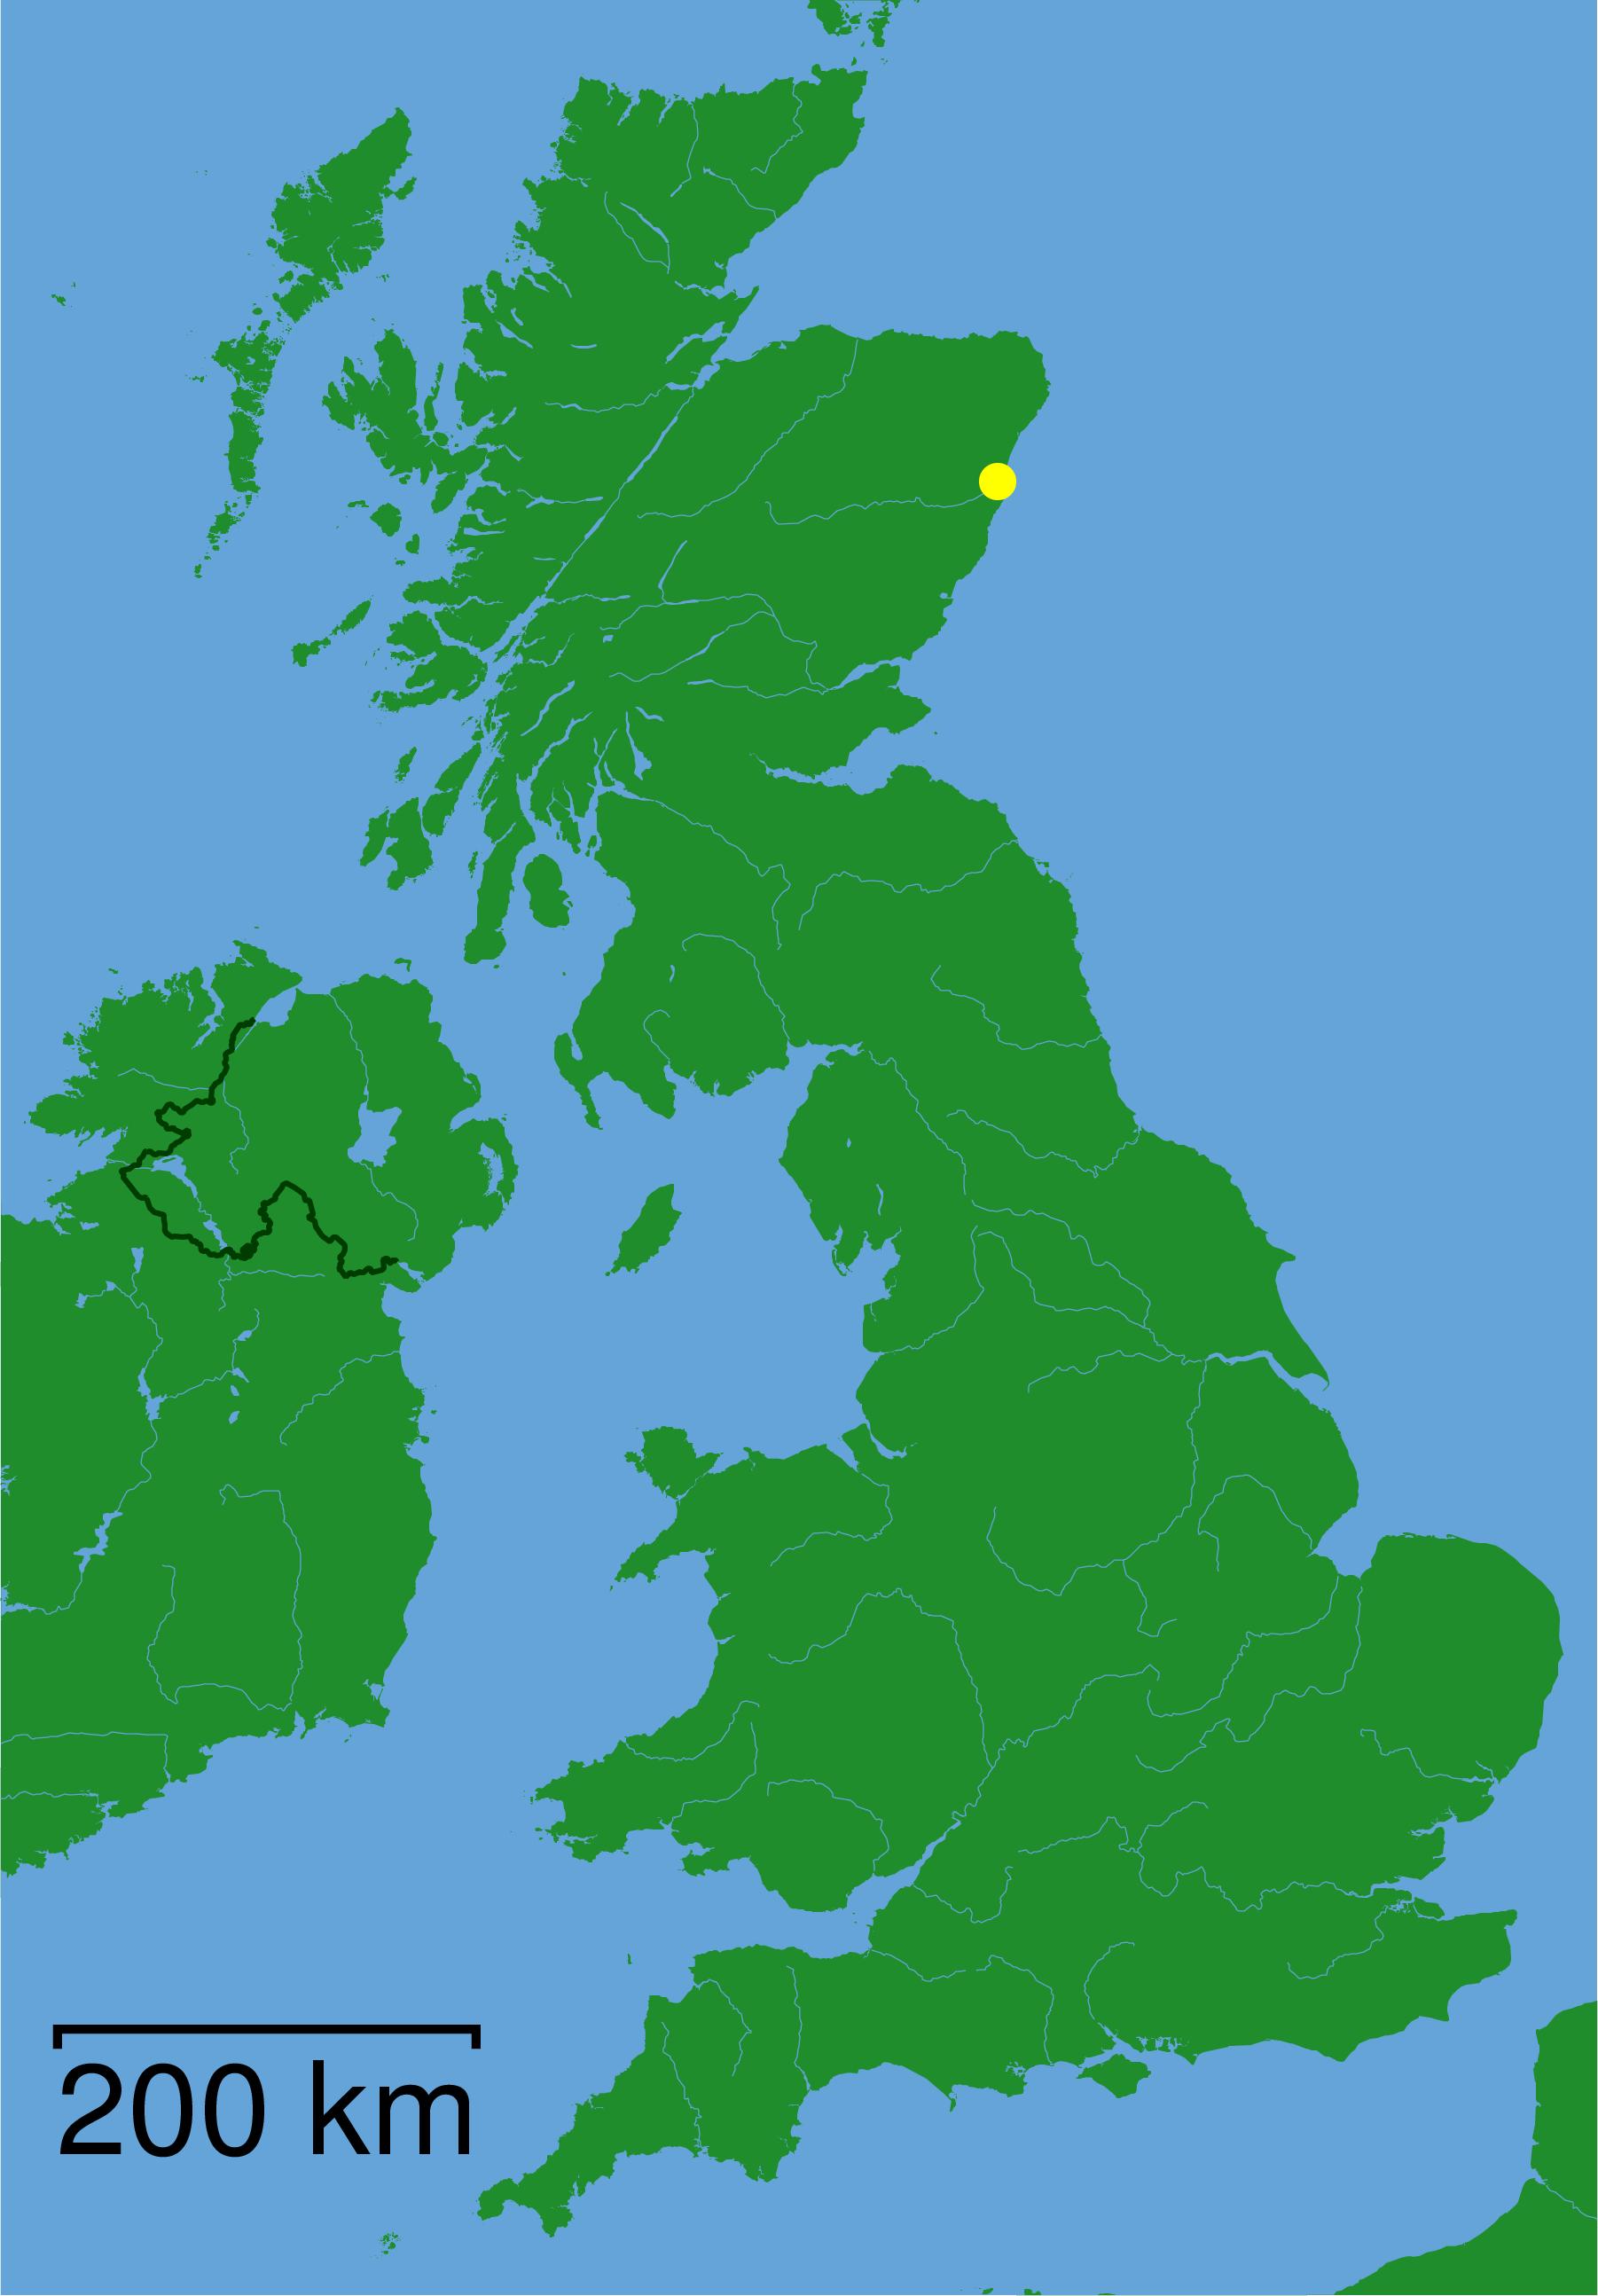 File:Aberdeen - City of Aberdeen dot.png - Wikimedia Commons